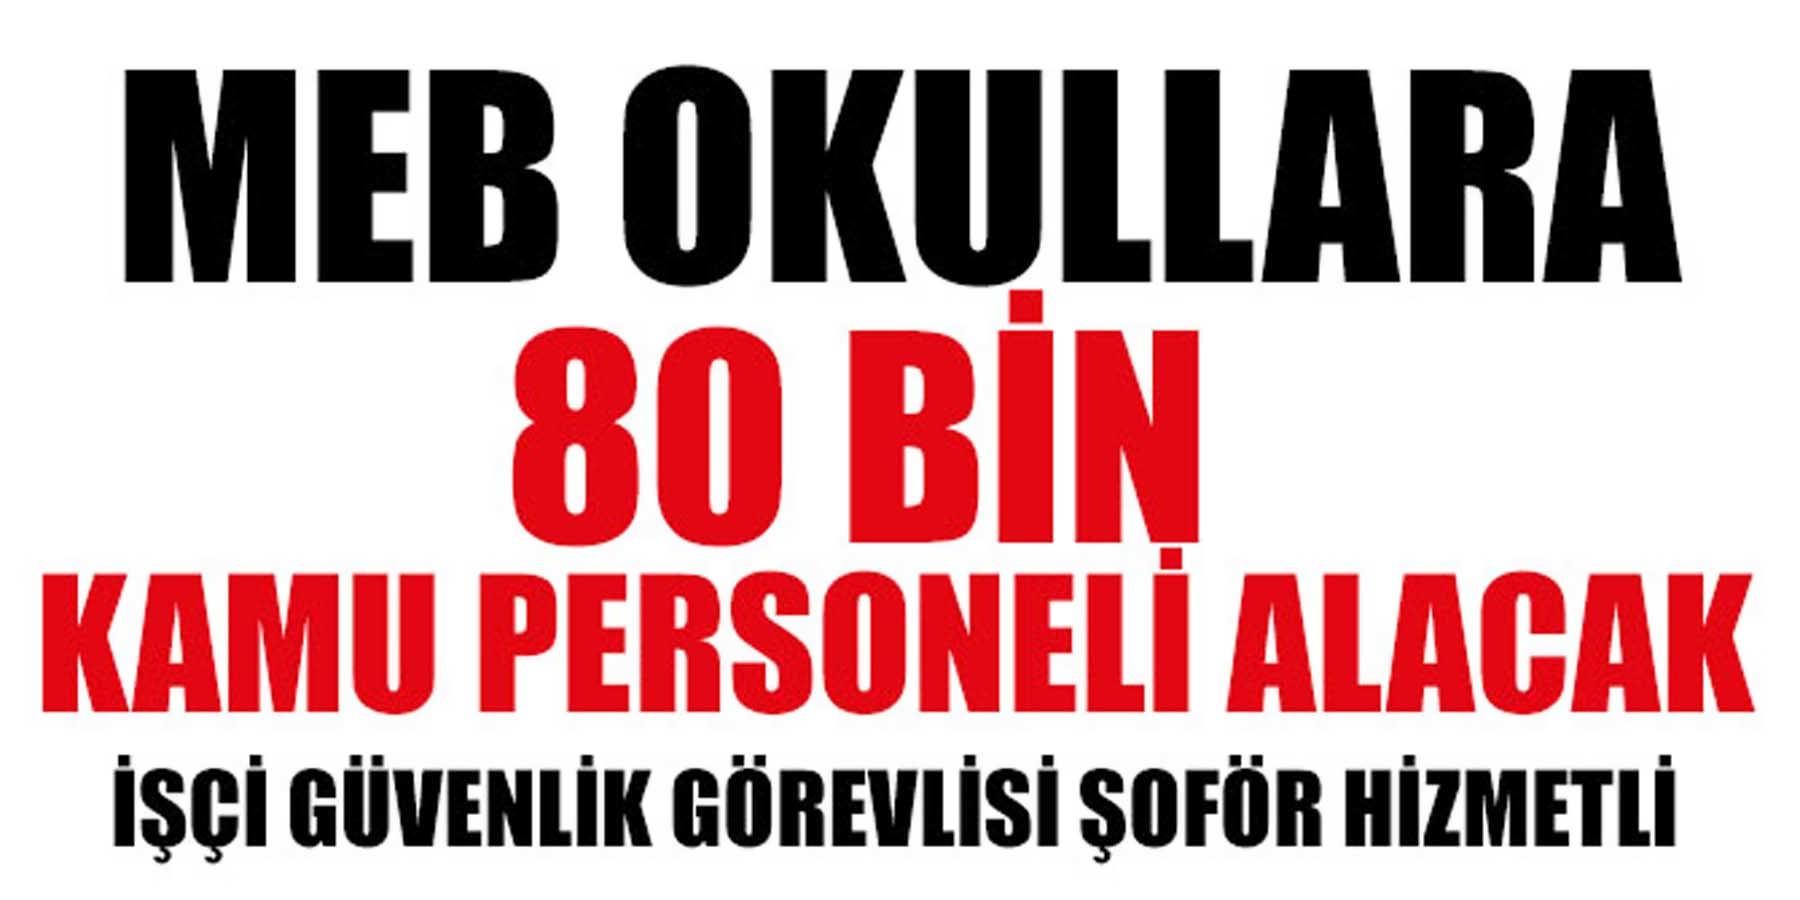 MEB TYP Okullara 80 Bin Kamu Personeli Alacak